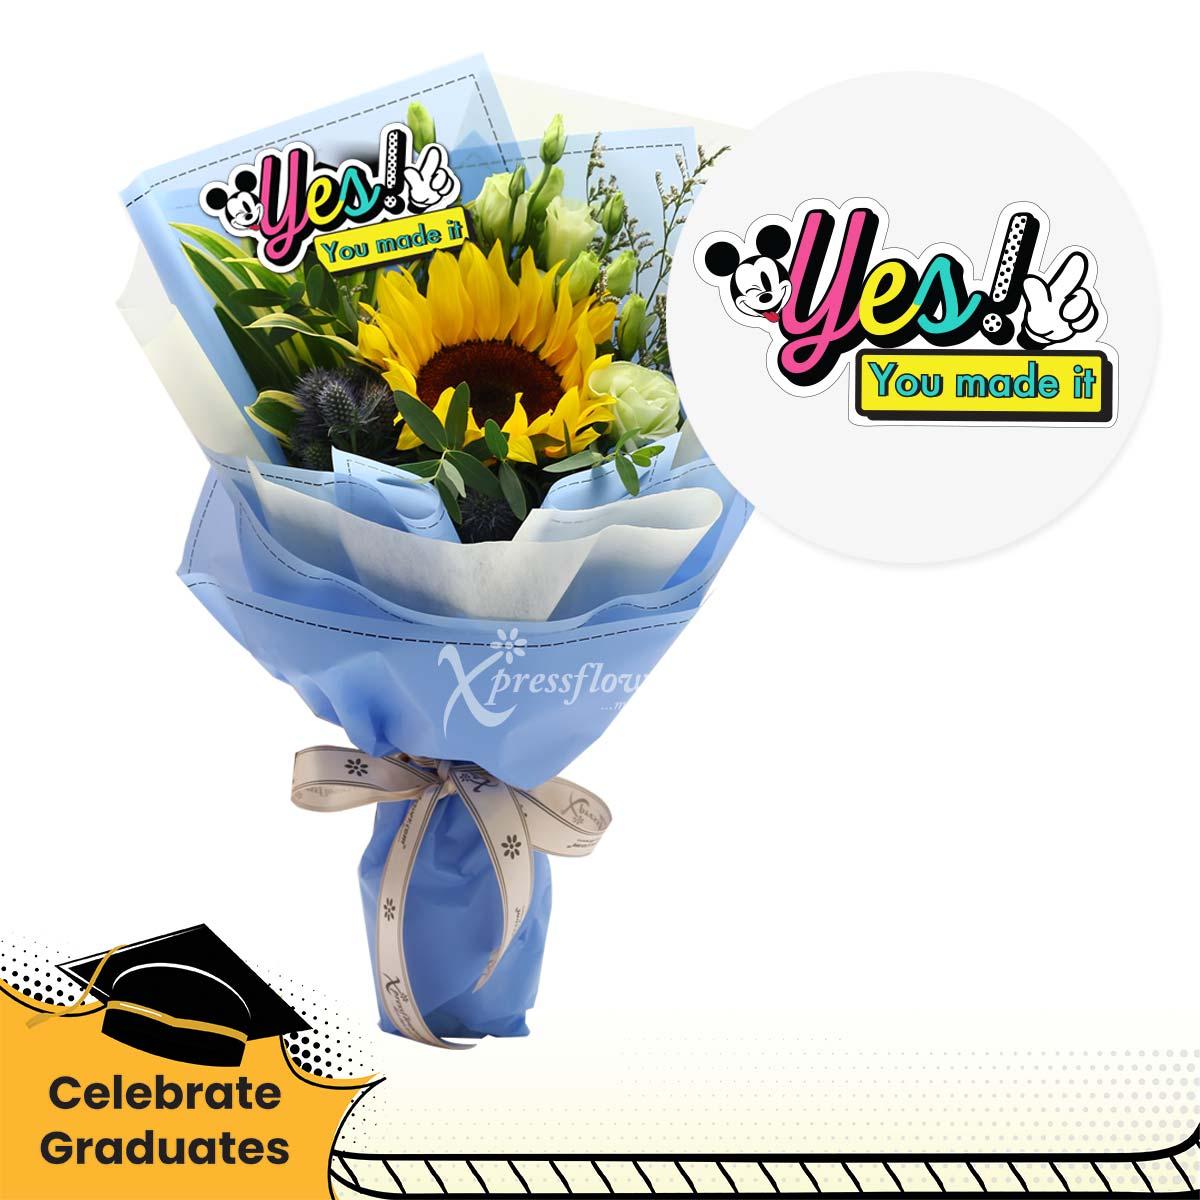 Winning in Life (1 sunflower Disney bouquet)